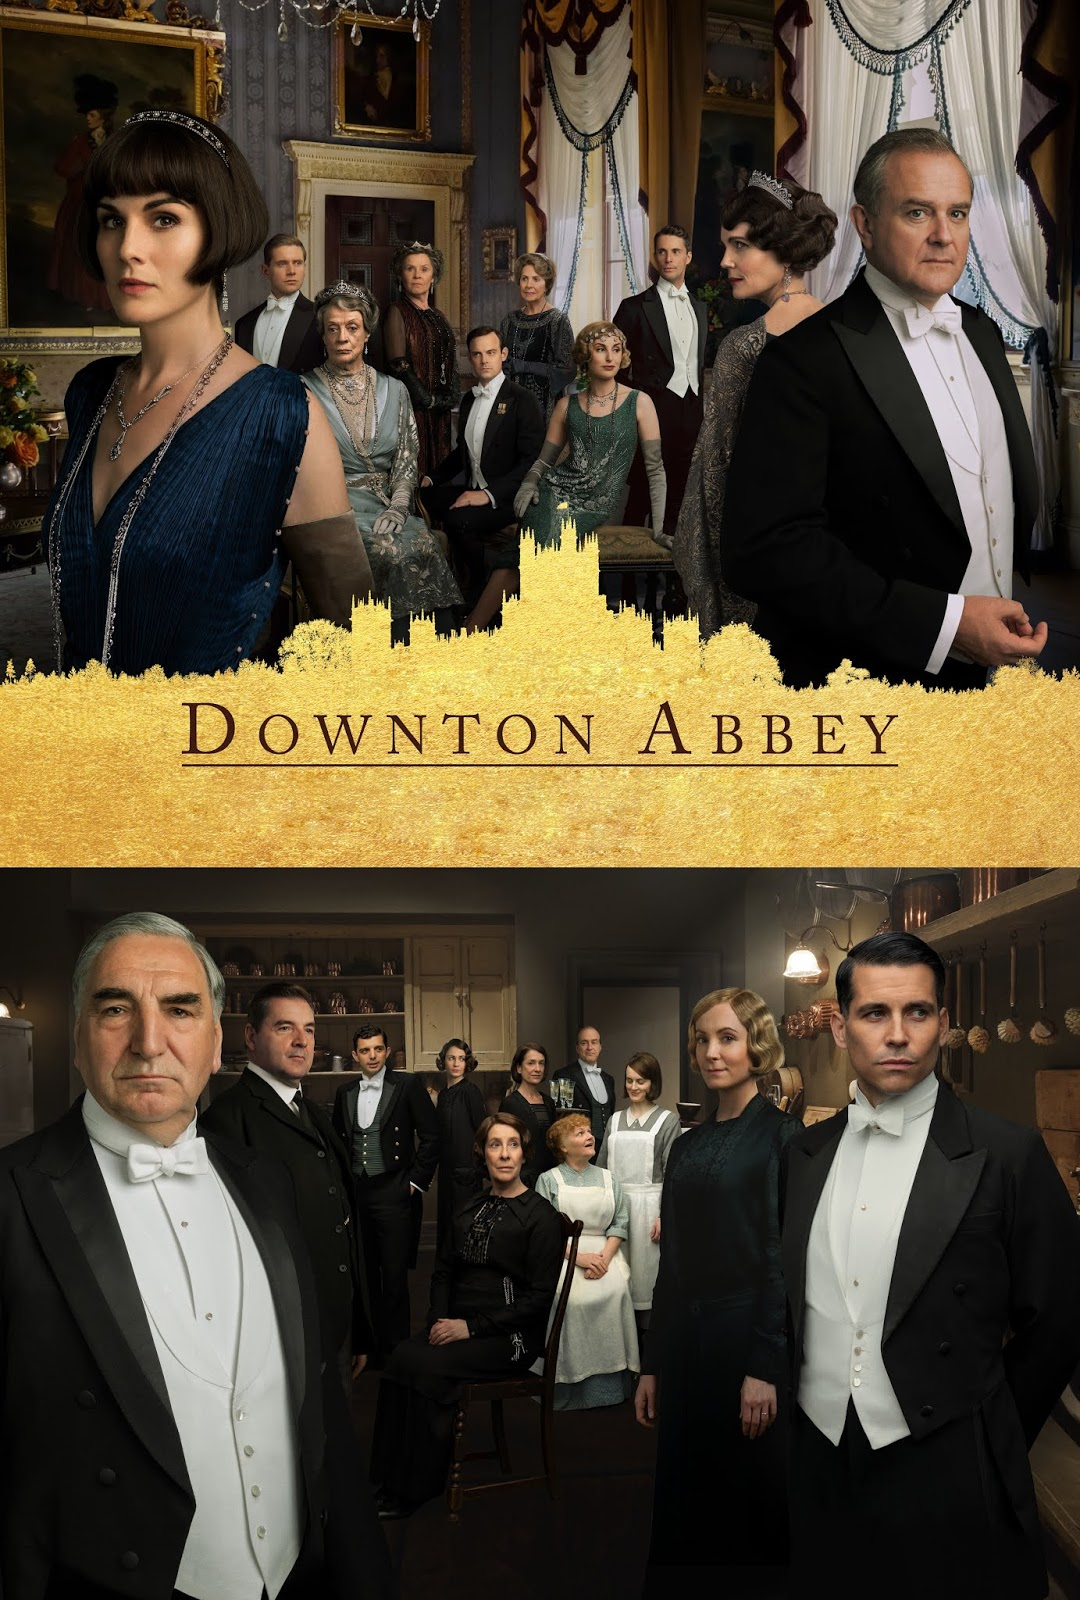 Downton Abbey [2019] [DVD9] [NTSC] [Latino]